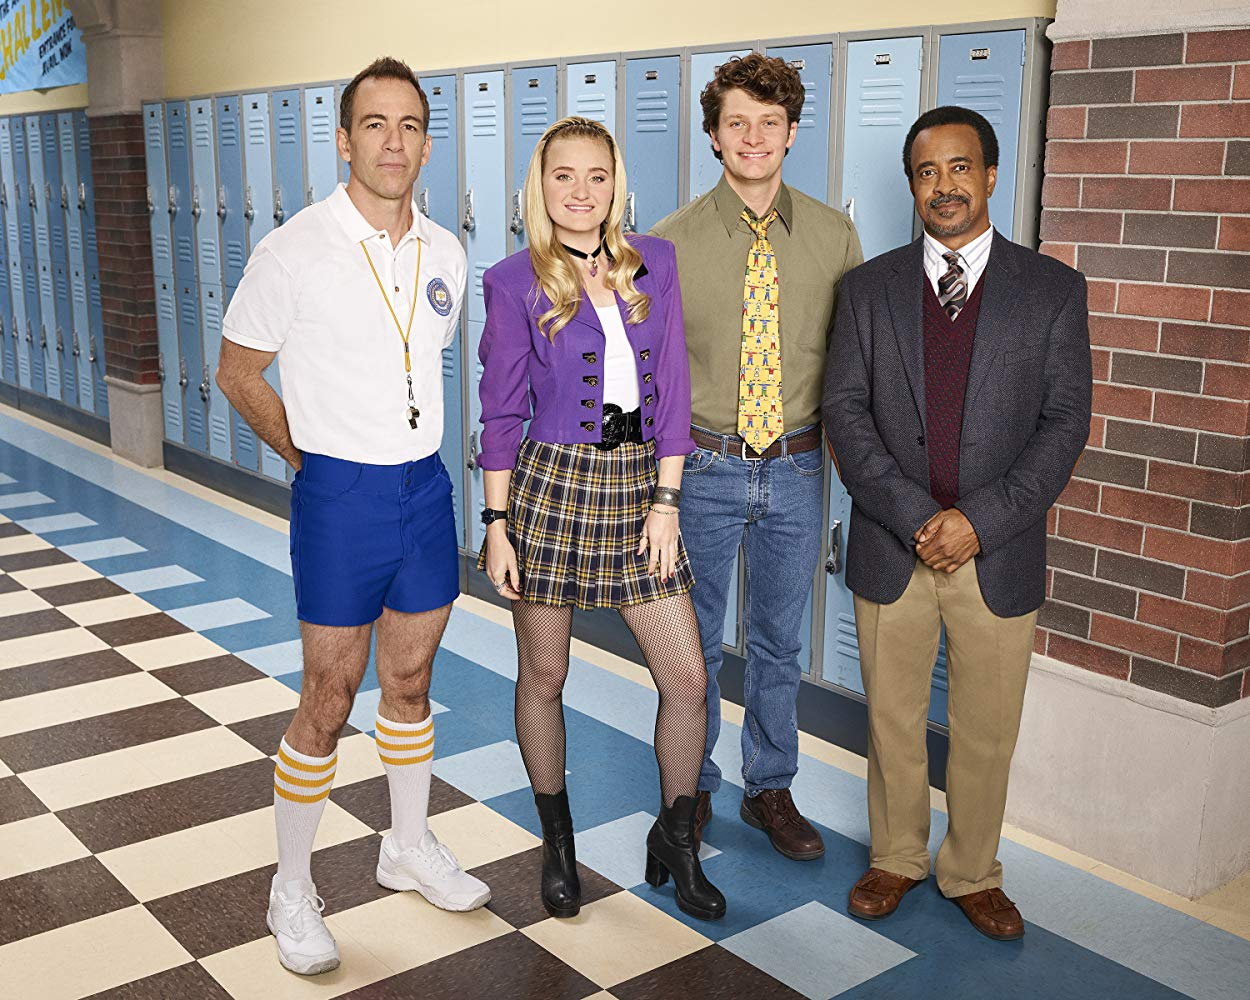 Schooled - Season 1